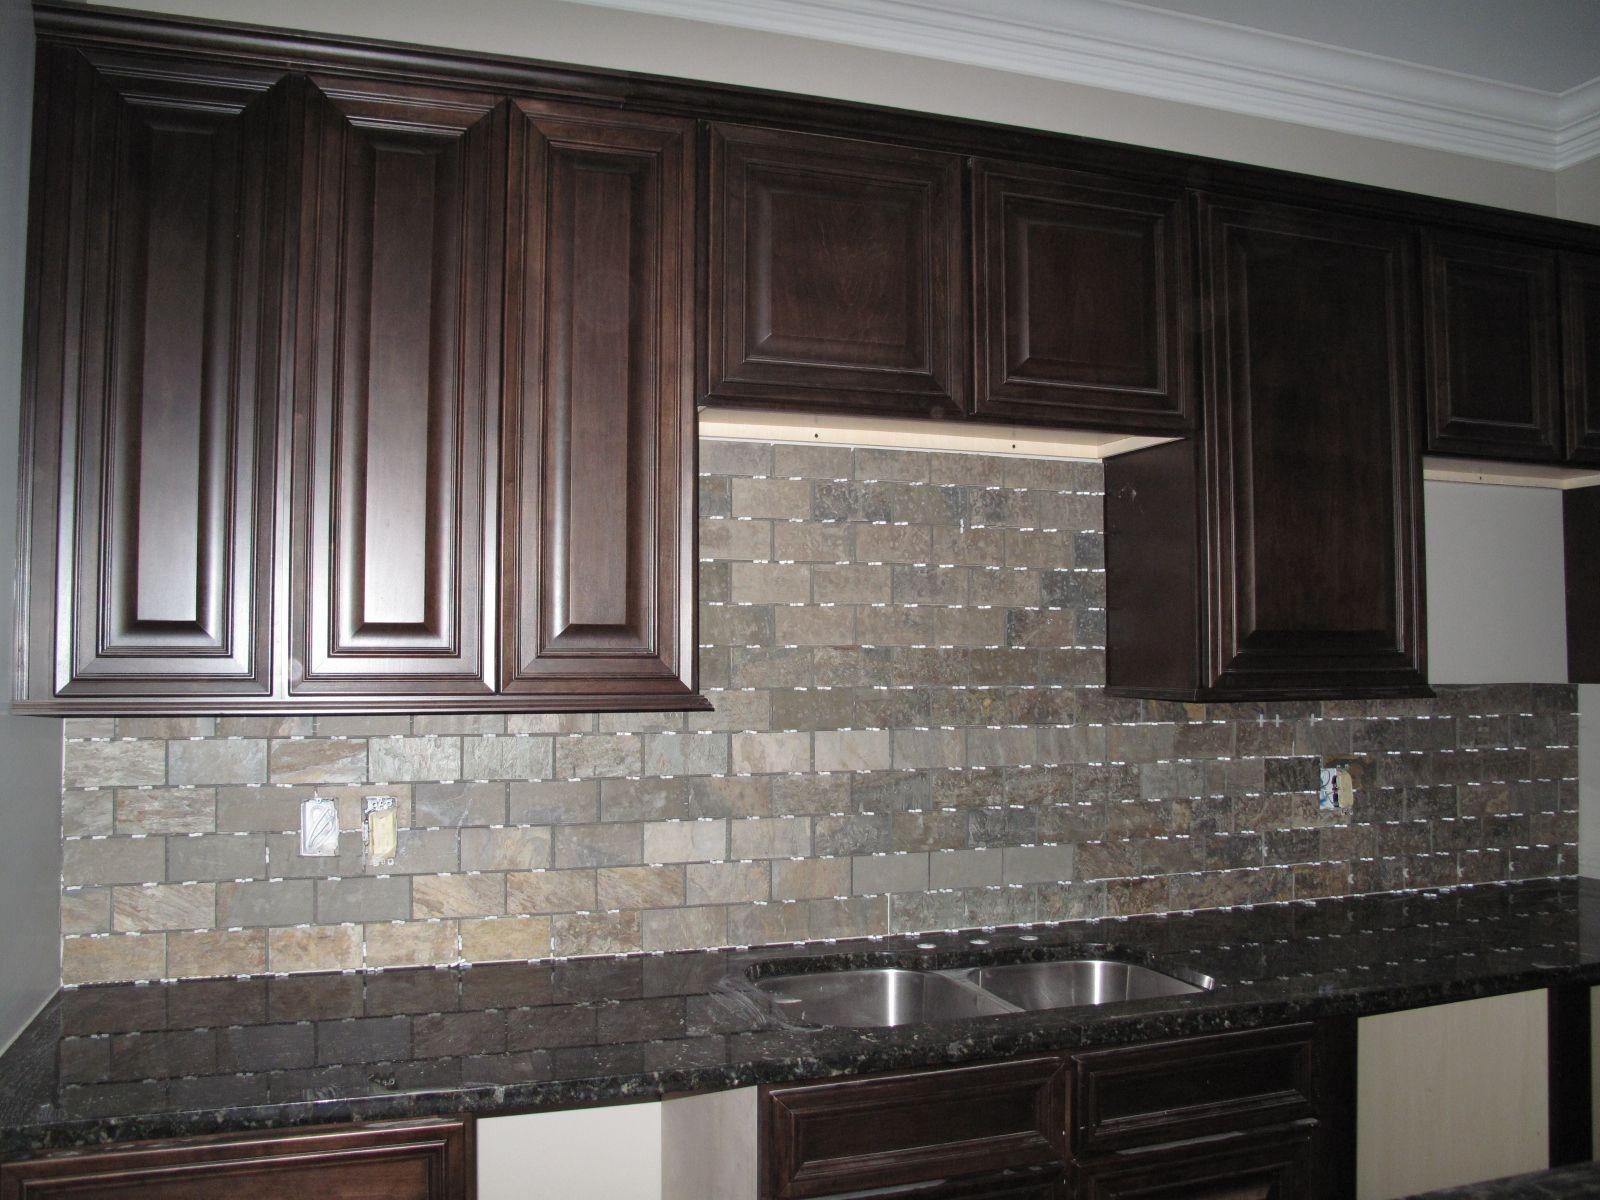 gray kitchen backsplash tile with brown